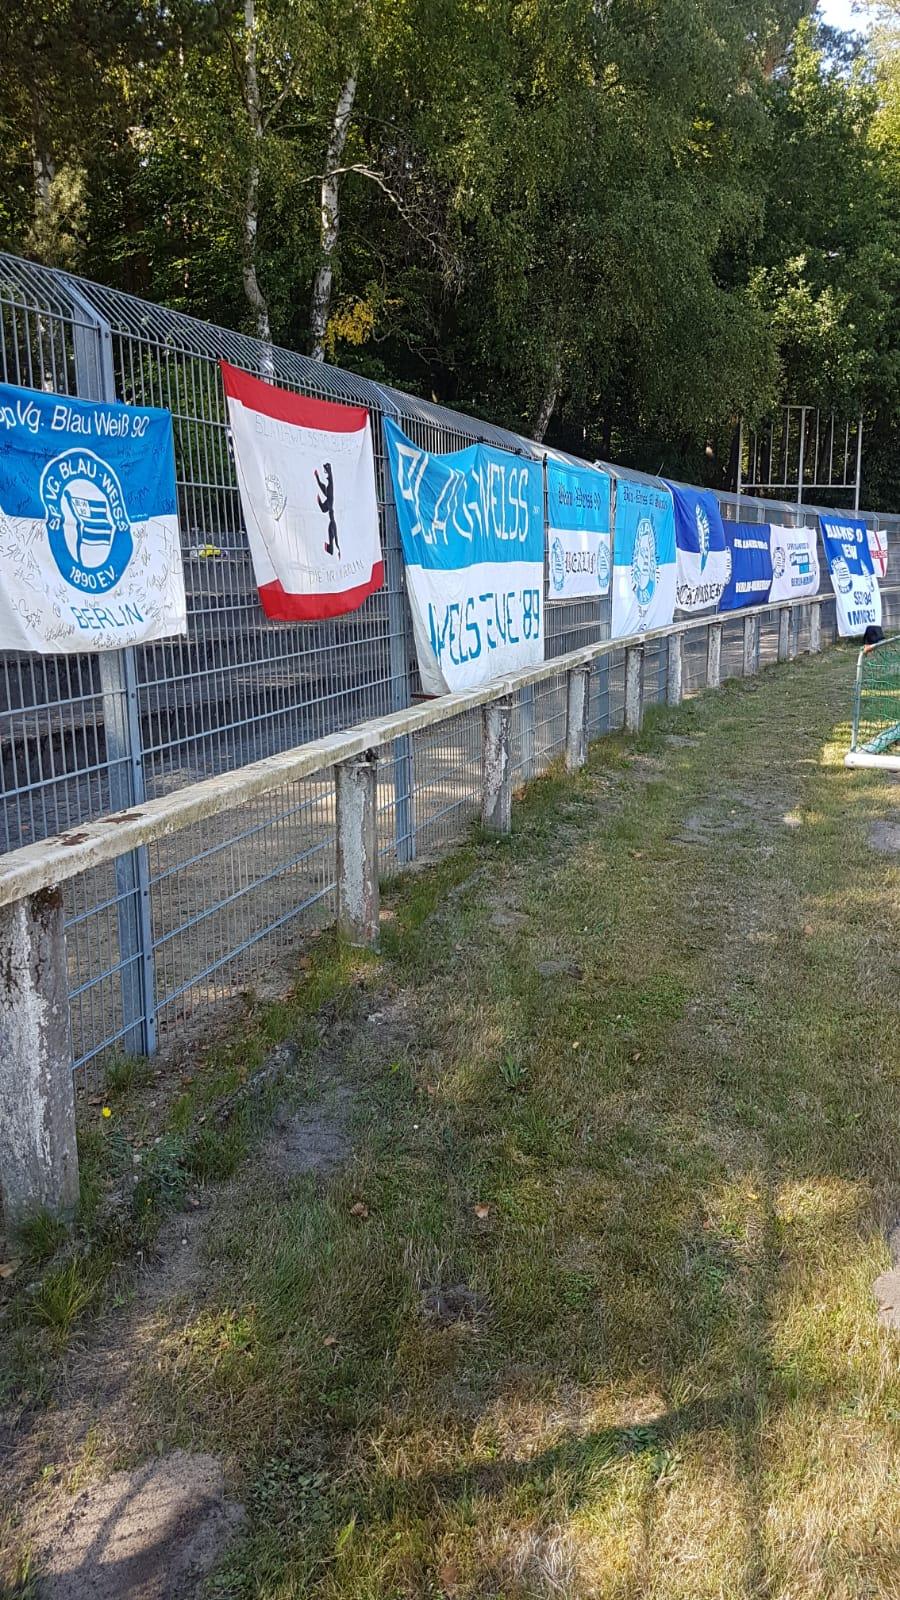 Der Vorbericht zum Pokalspiel gegen den FC Phönix Amed Berlin